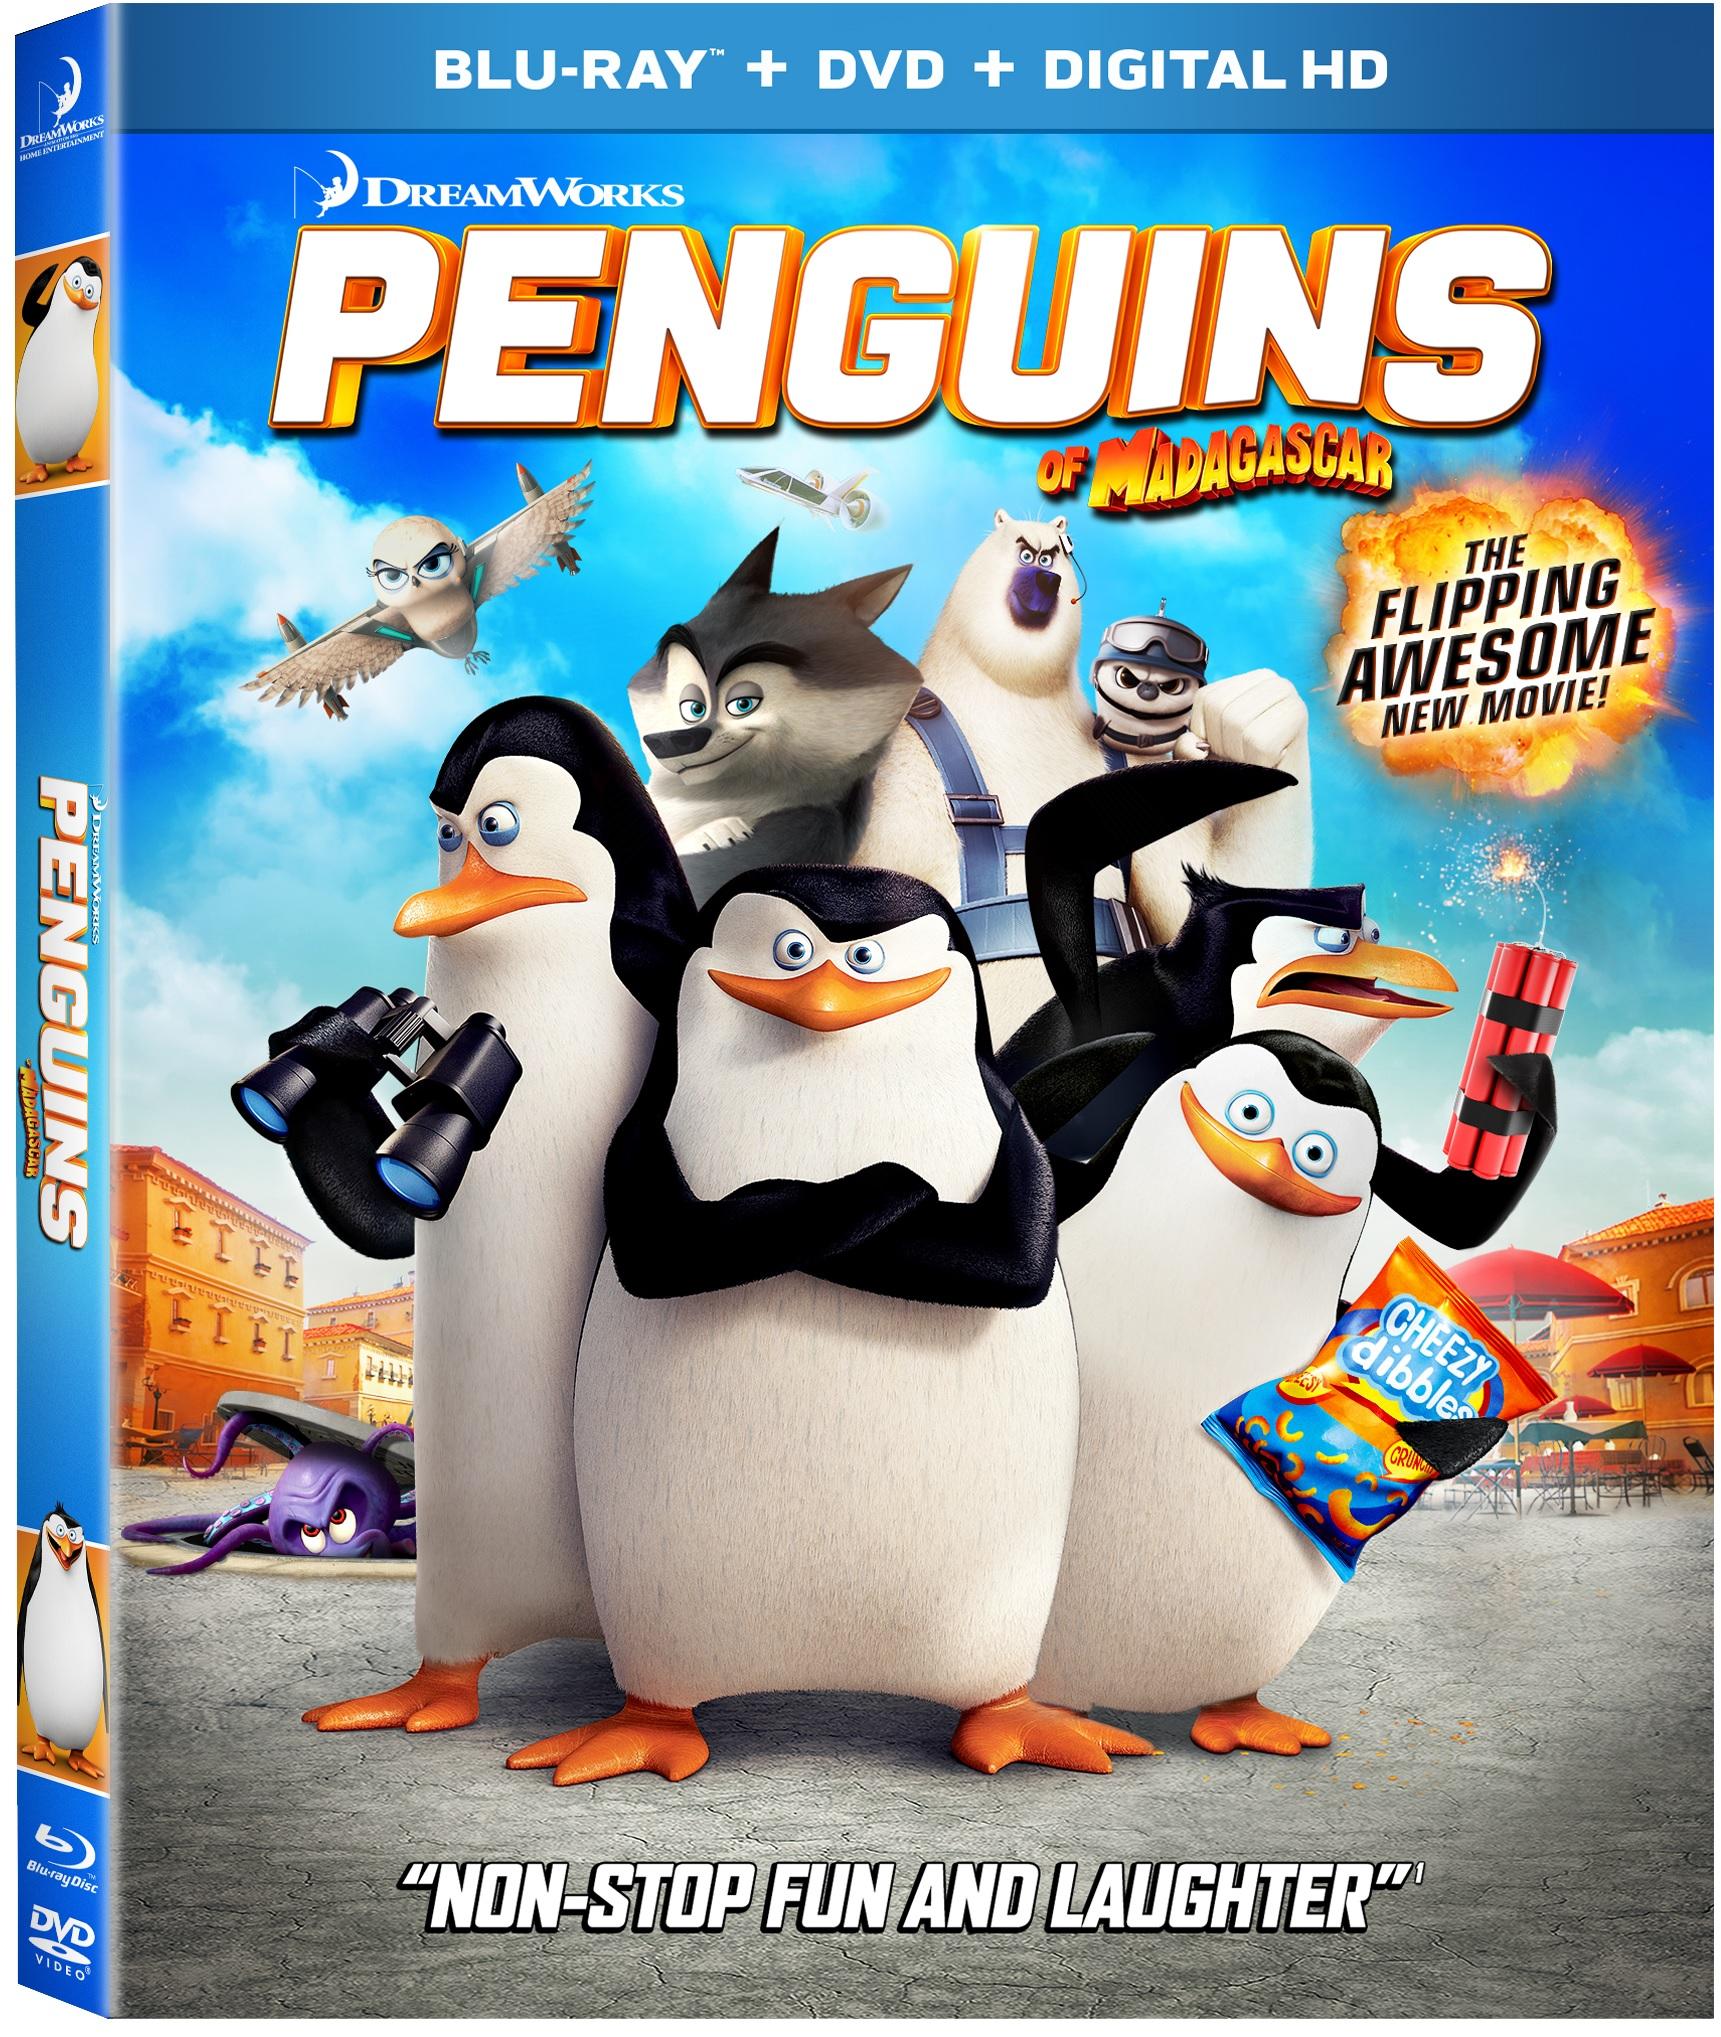 THE PENGUINS OF MADAGASCAR Blu-ray